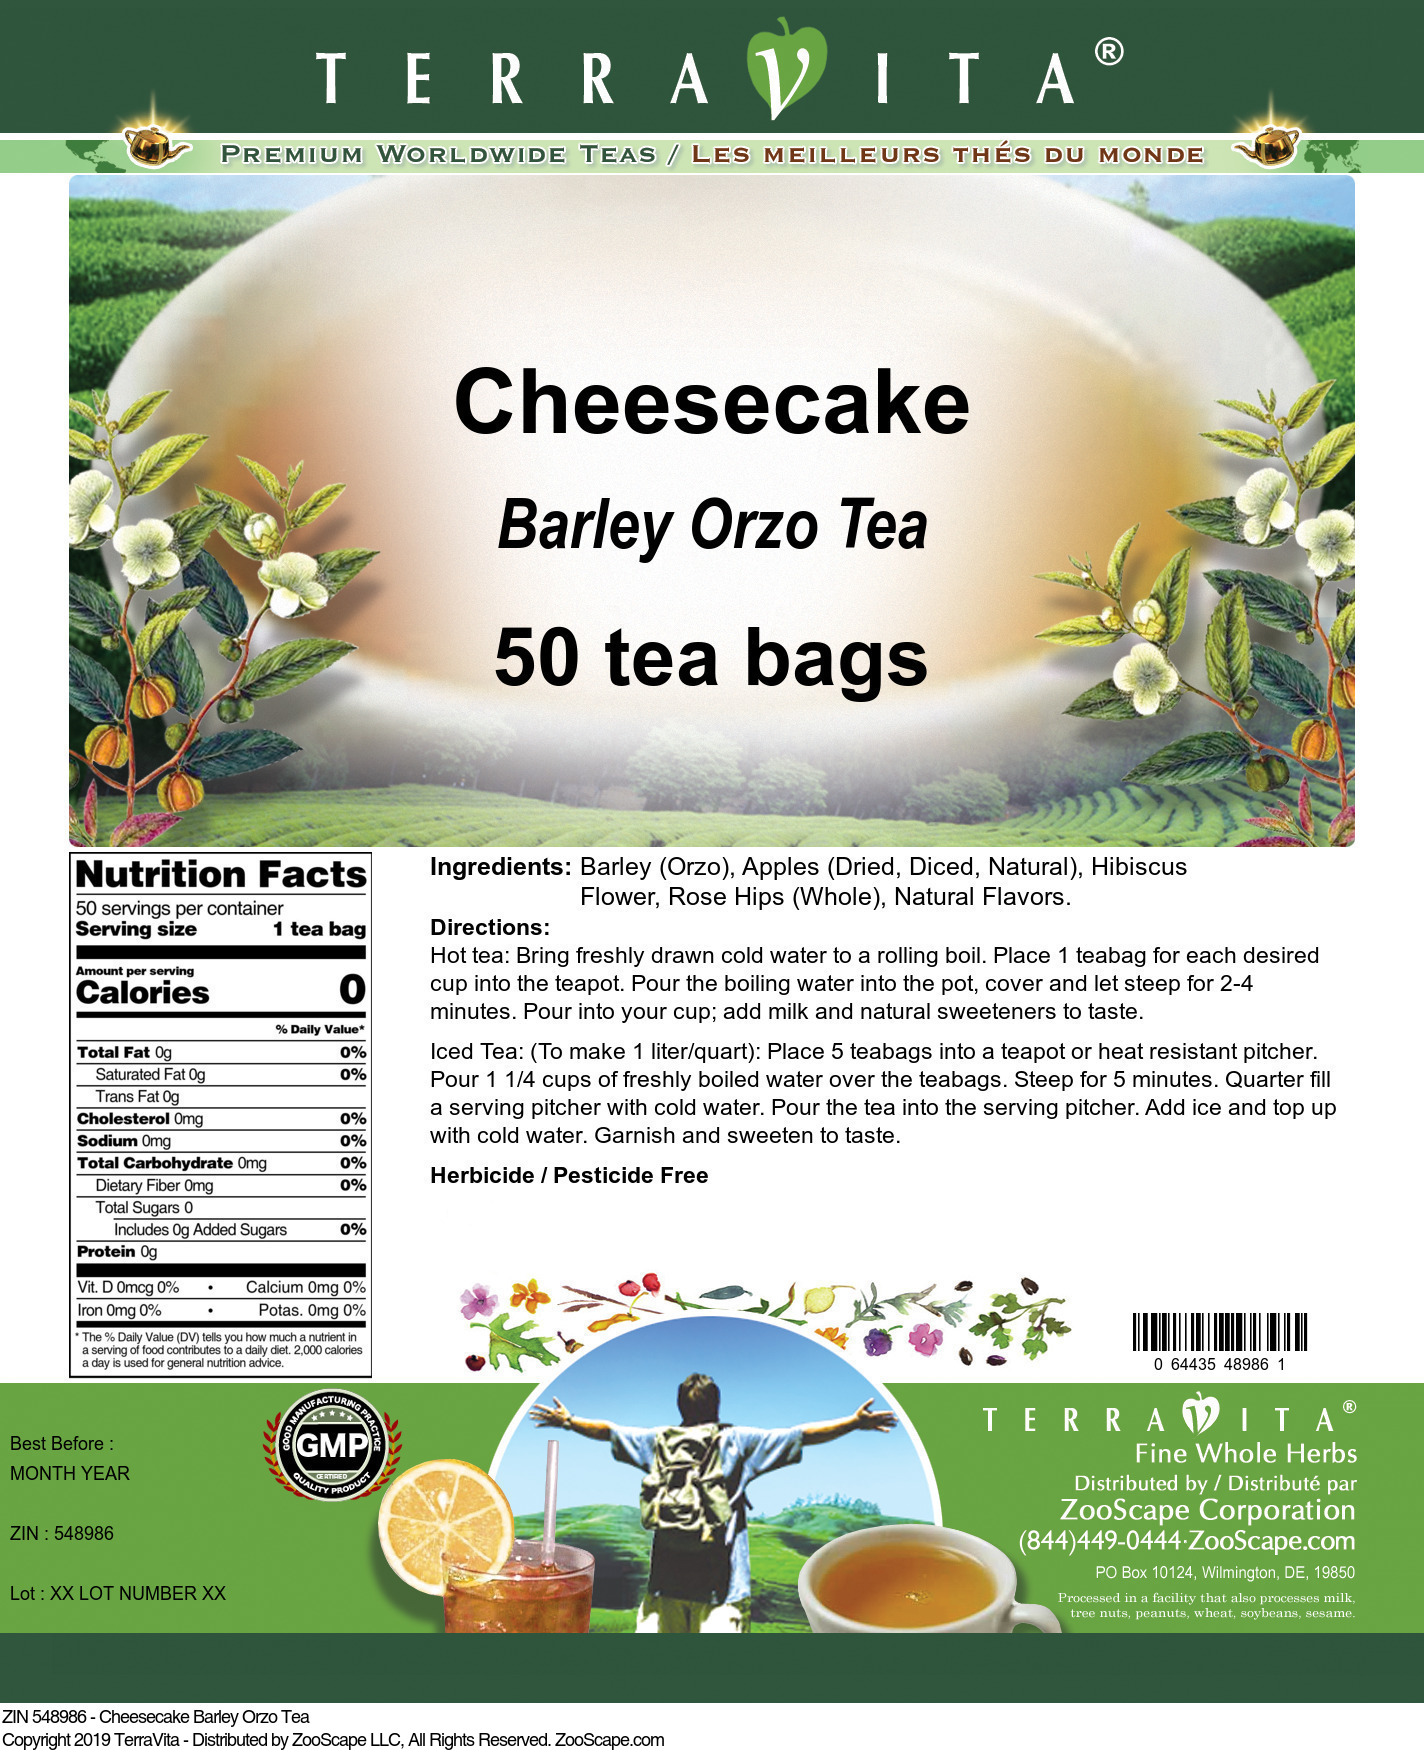 Cheesecake Barley Orzo